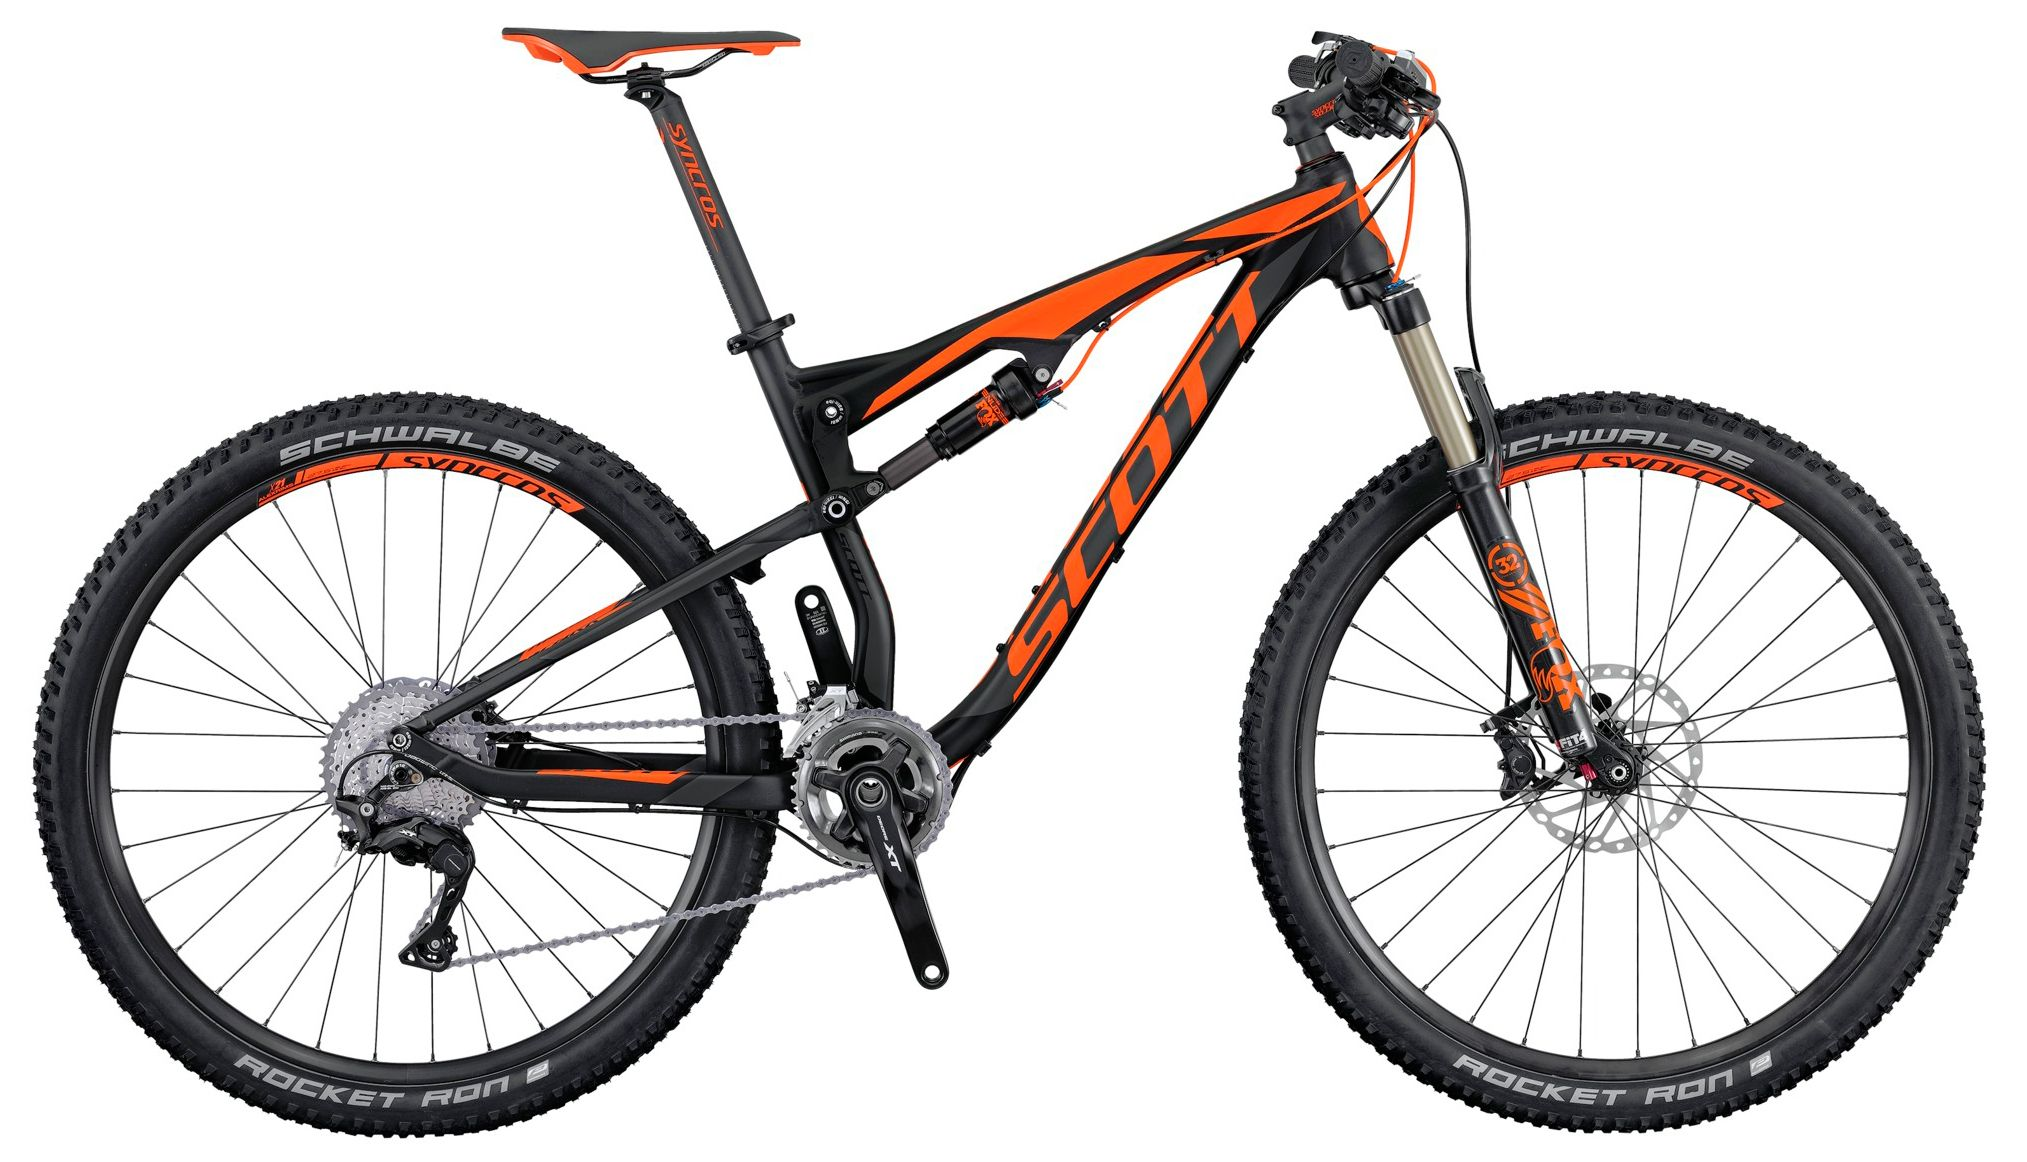 Велосипед Scott Spark 740 2016 велосипед scott aspect 700 27 5 2016